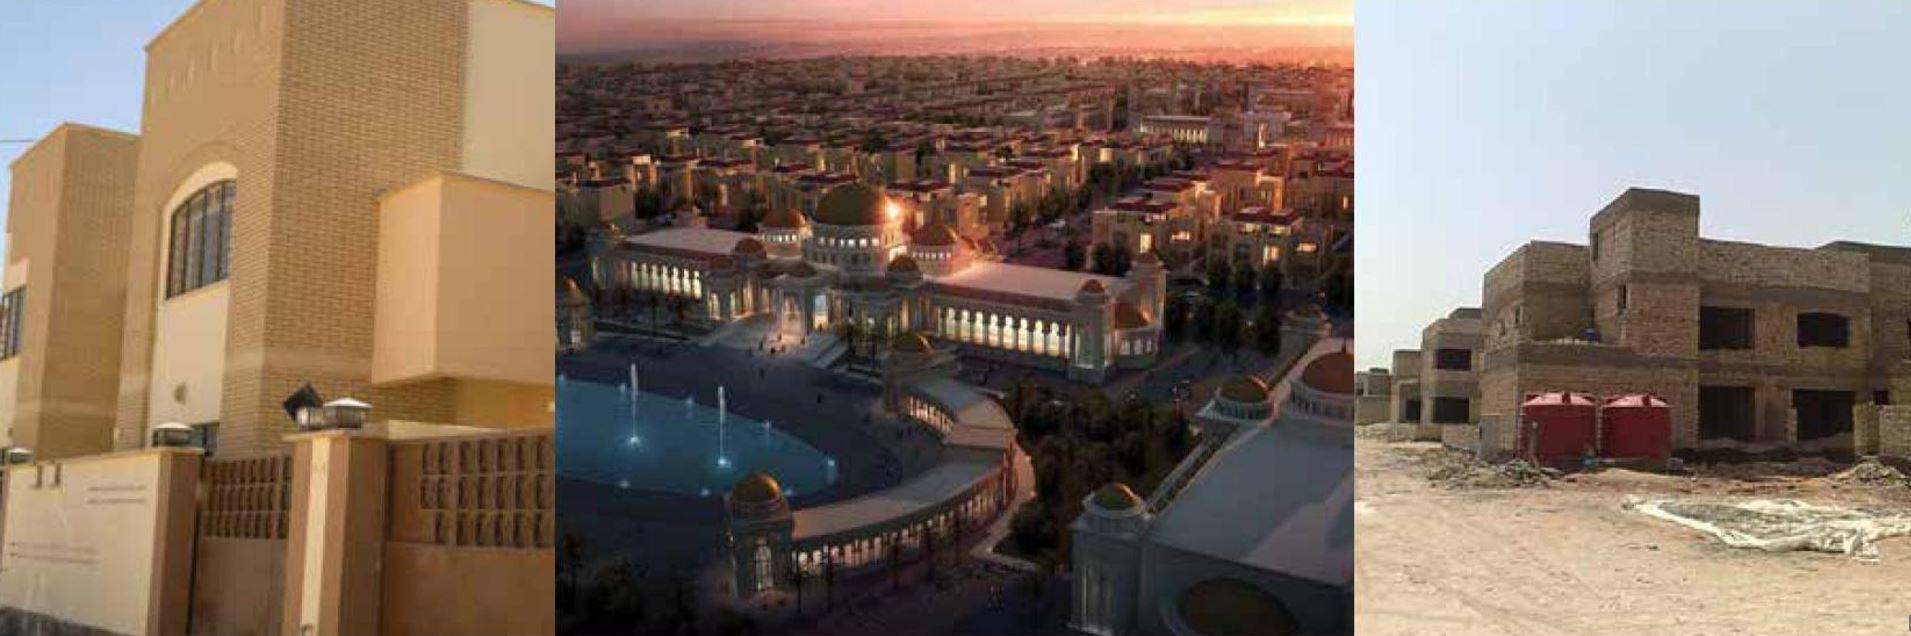 Necef Bilim Şehri 110 Adet Villa İnşaatı